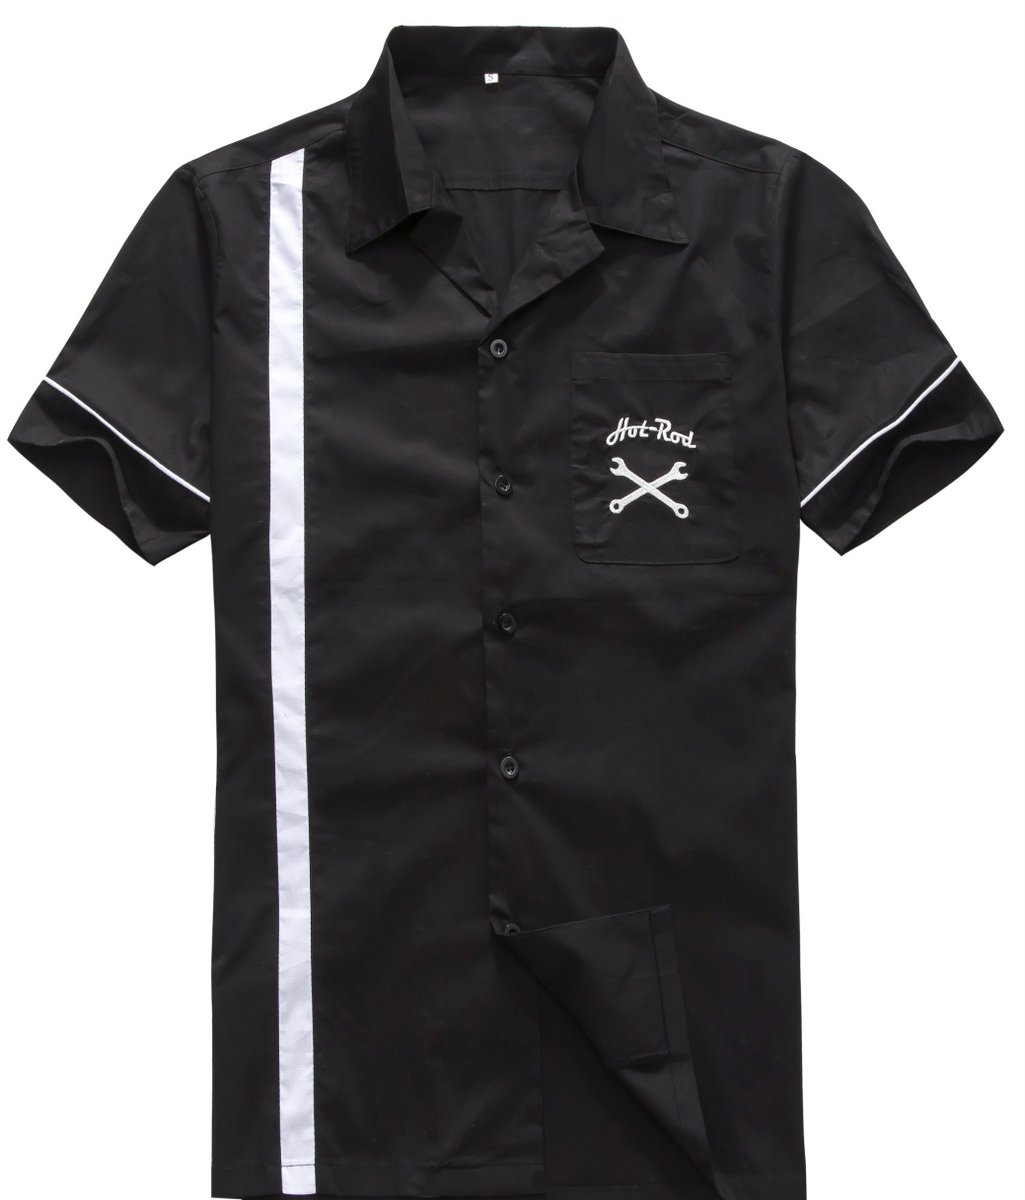 Online Get Cheap Cotton Bowling Shirt -Aliexpress.com | Alibaba Group